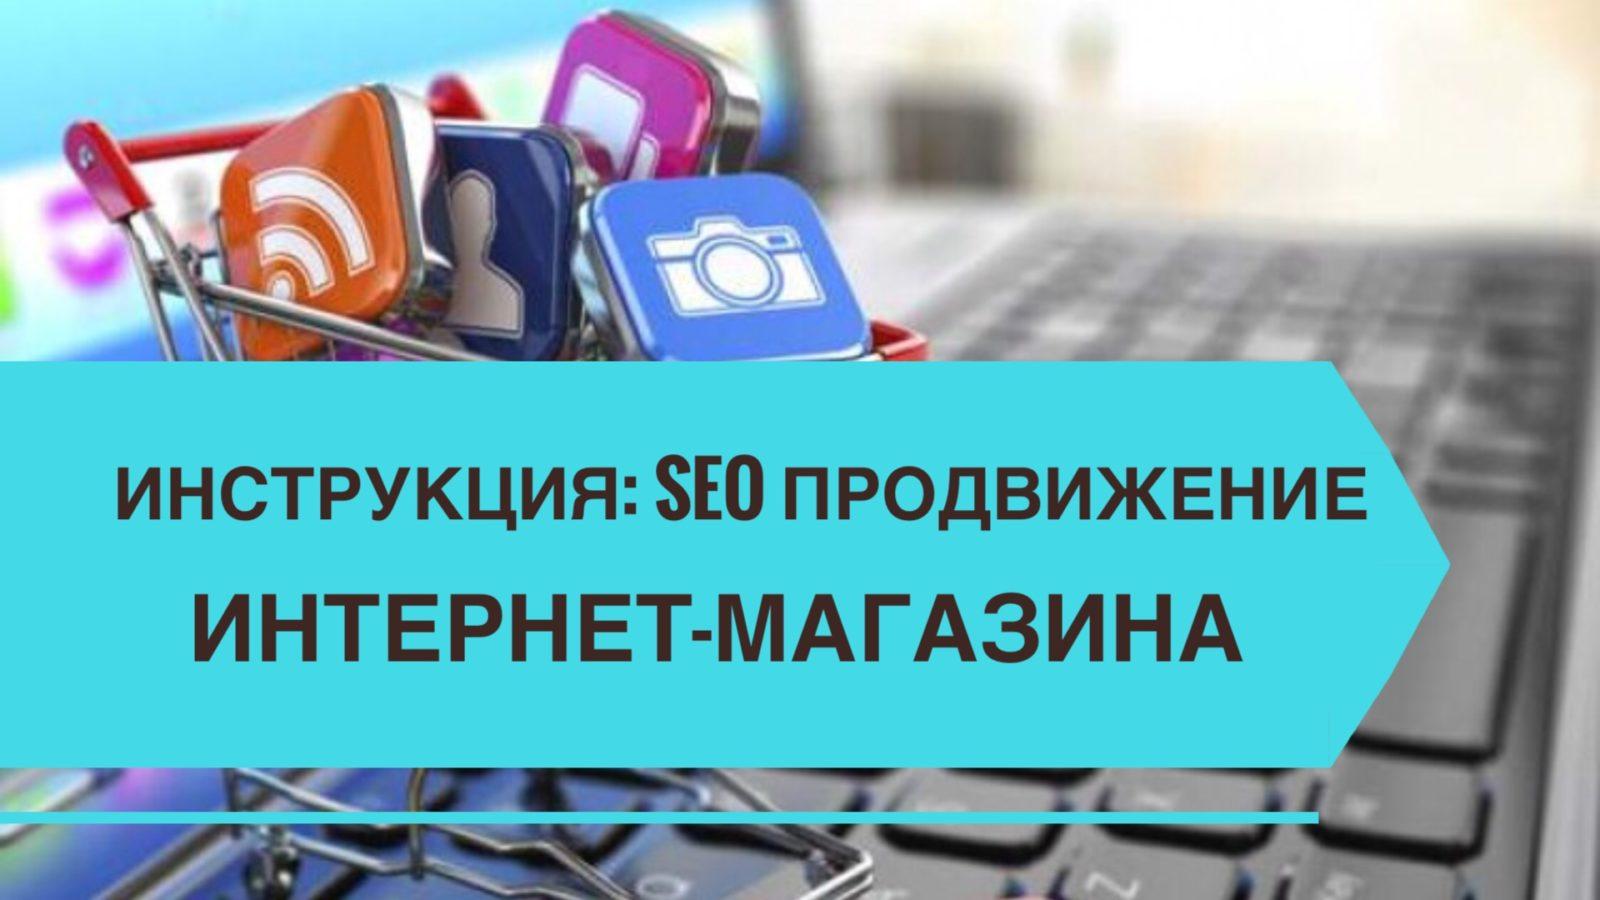 1f0b5bd5f SEO продвижение интернет магазина - особенности и правила